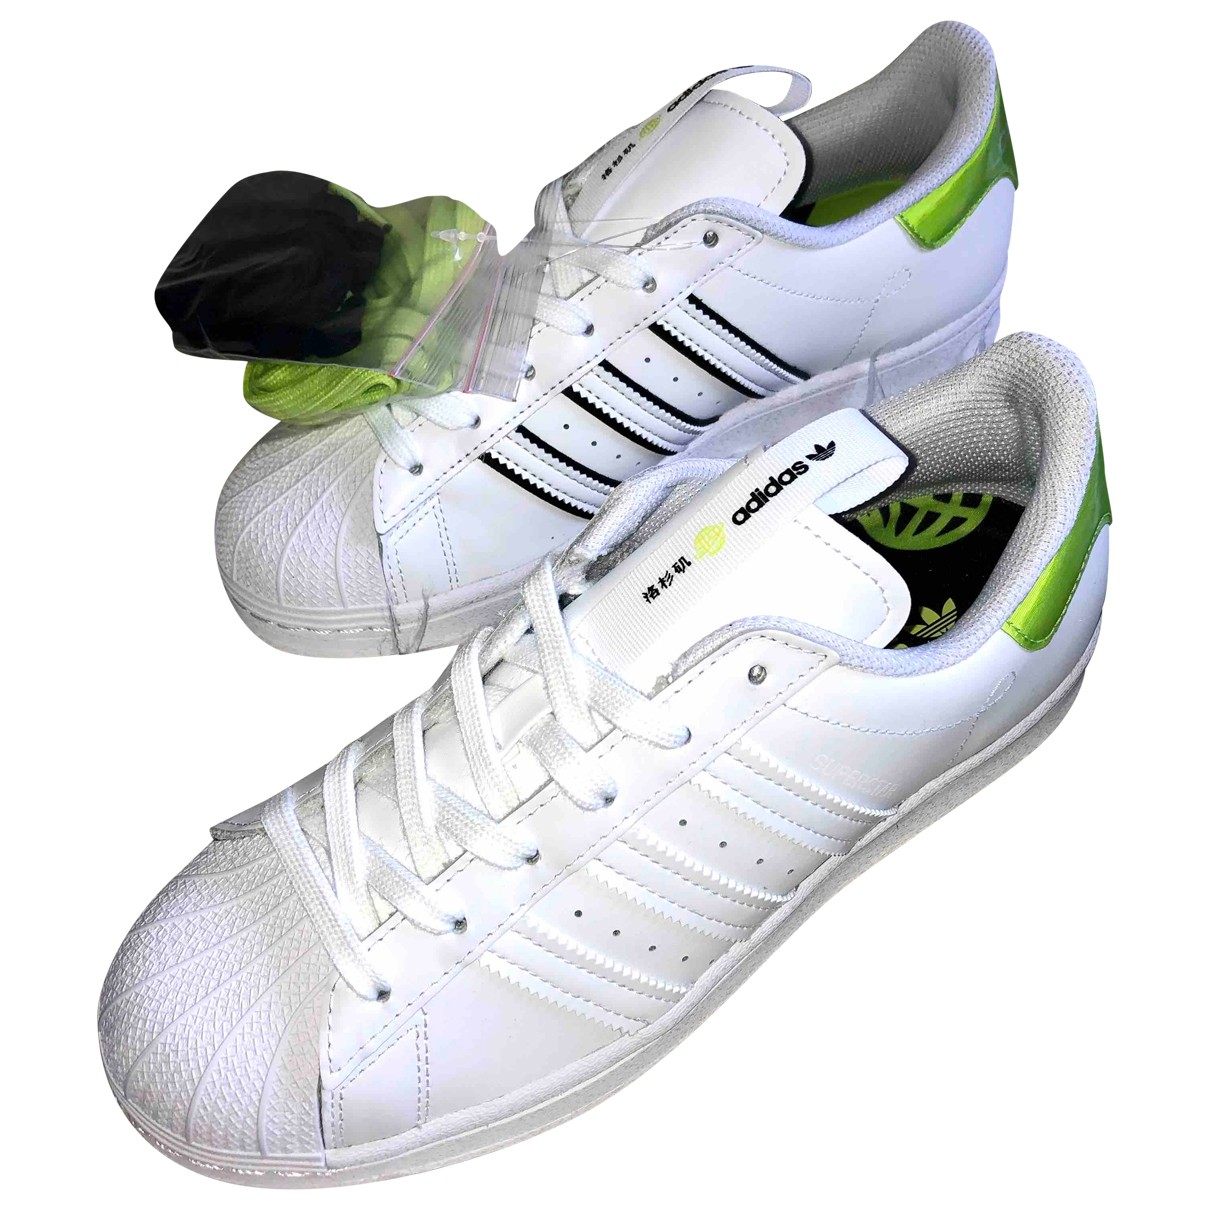 Adidas - Baskets Superstar pour femme en cuir - blanc